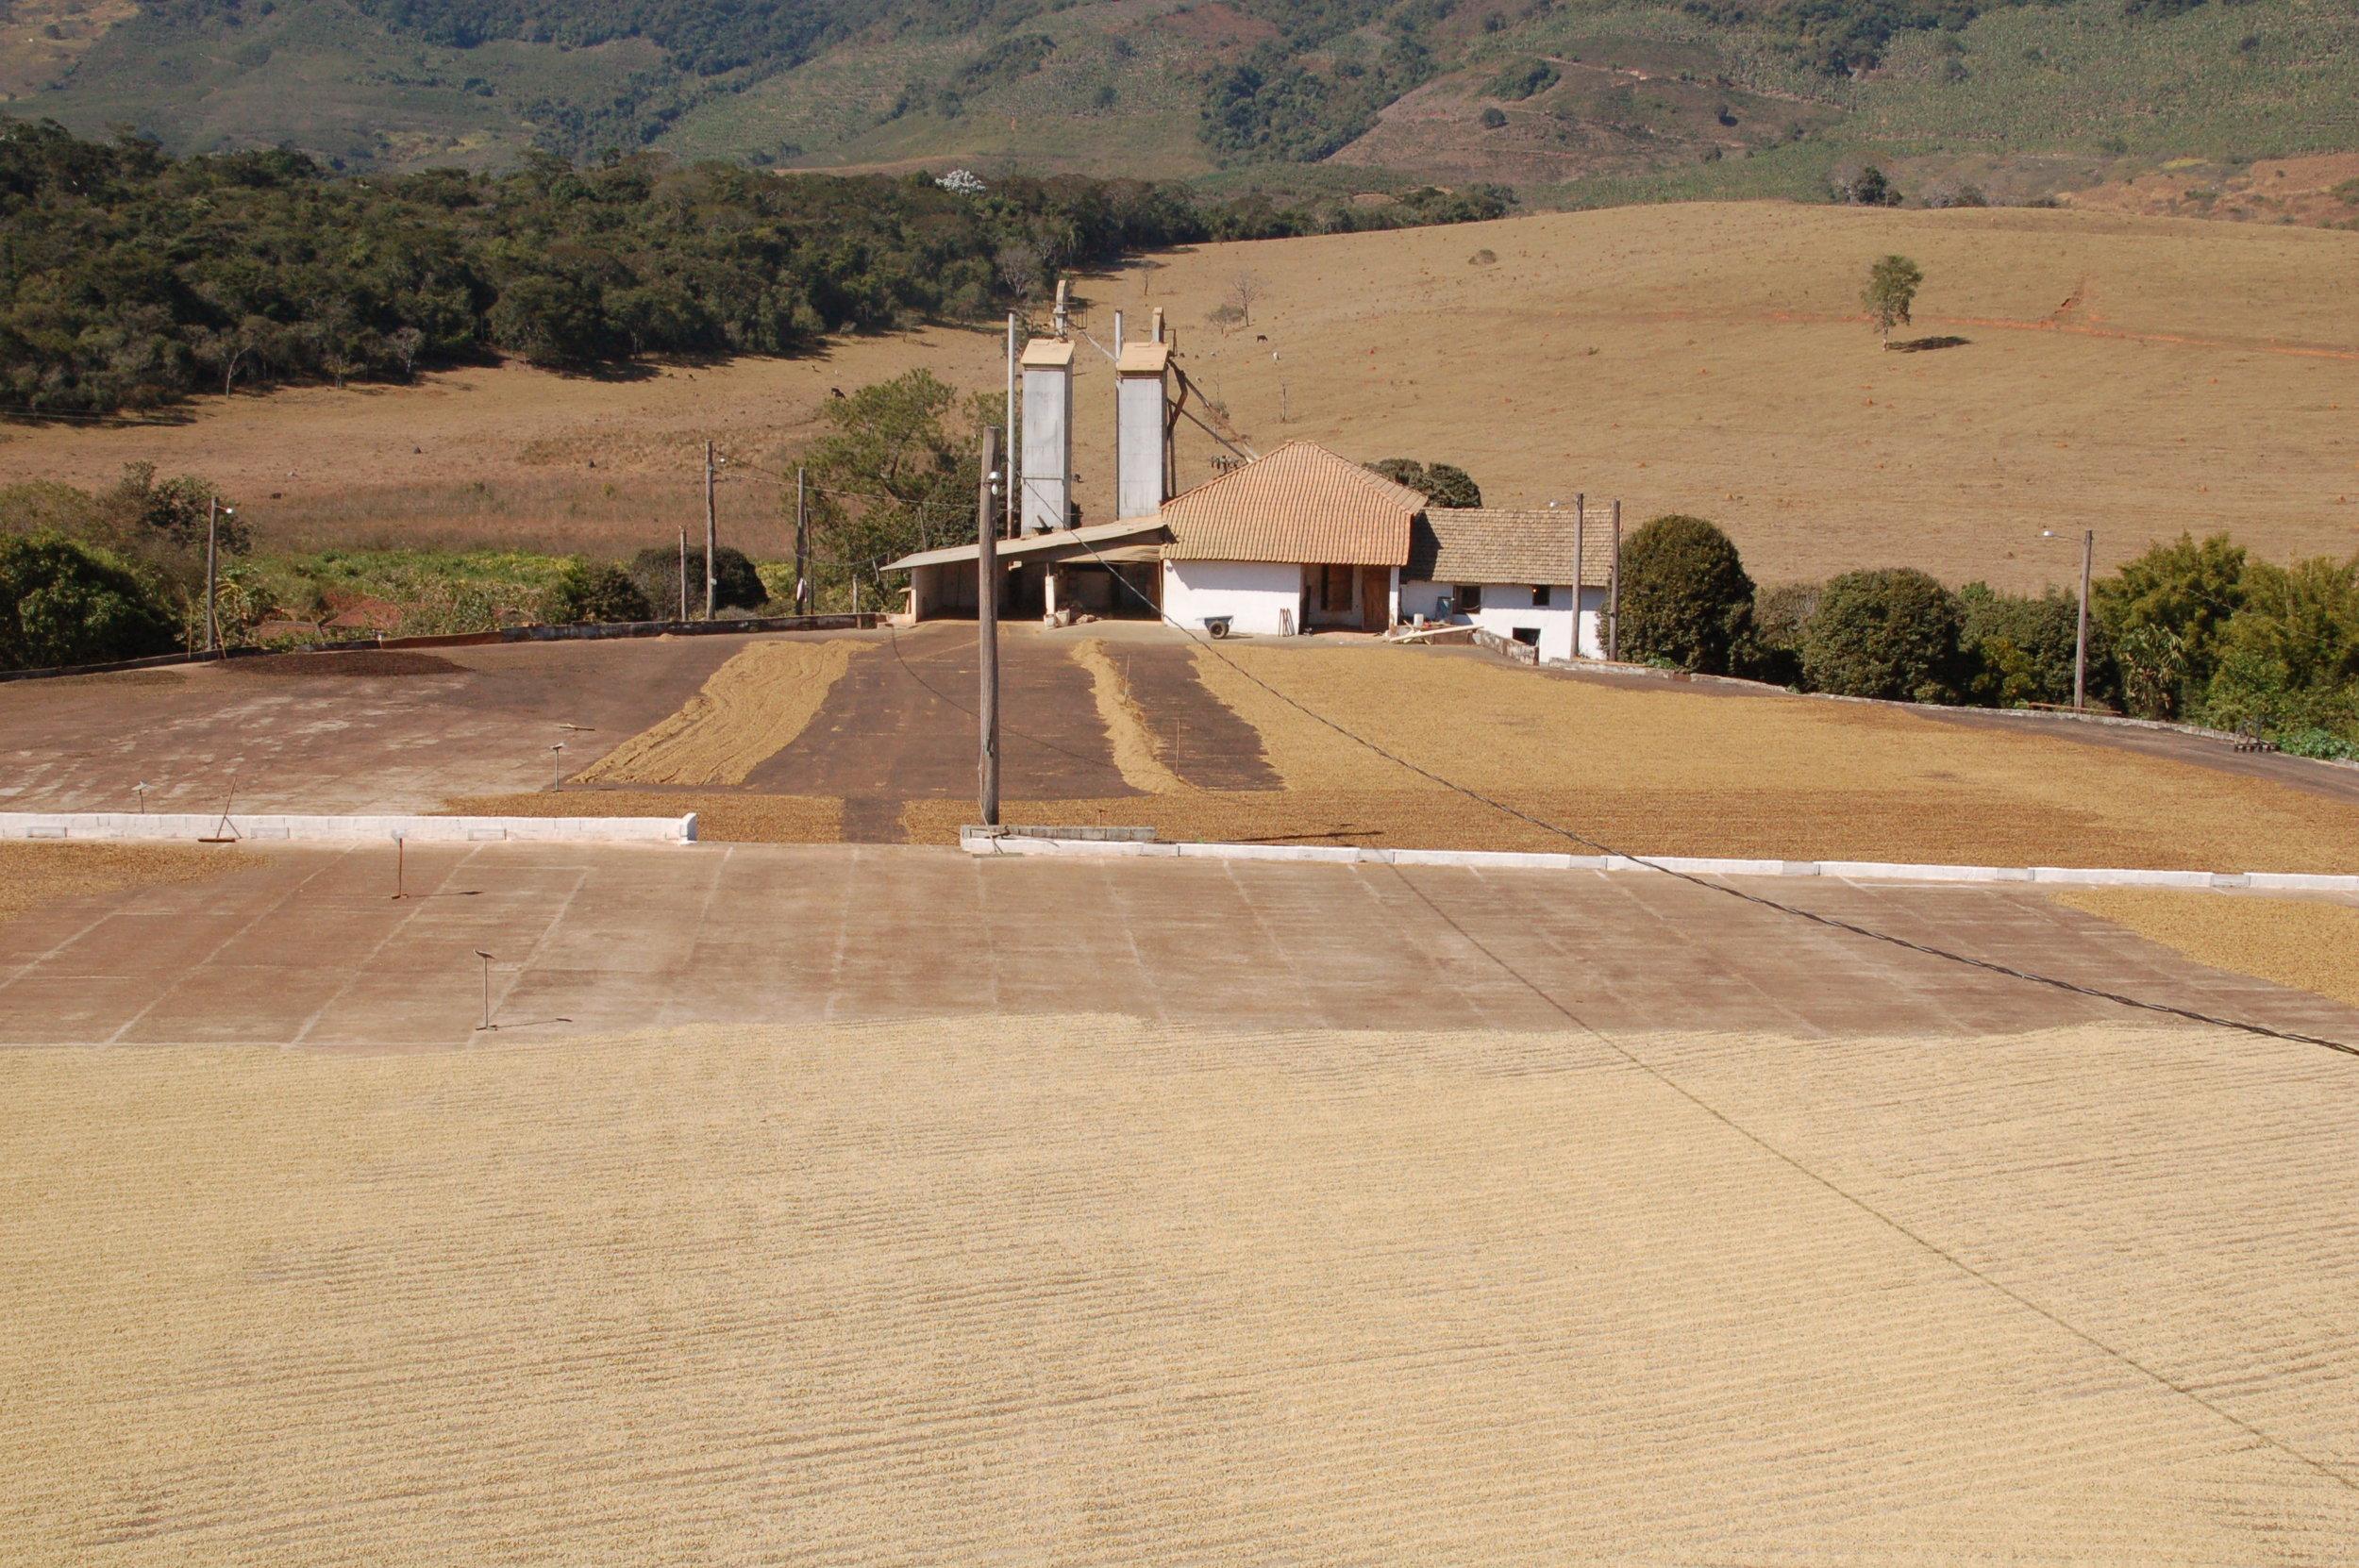 Fazenda Santa Ines